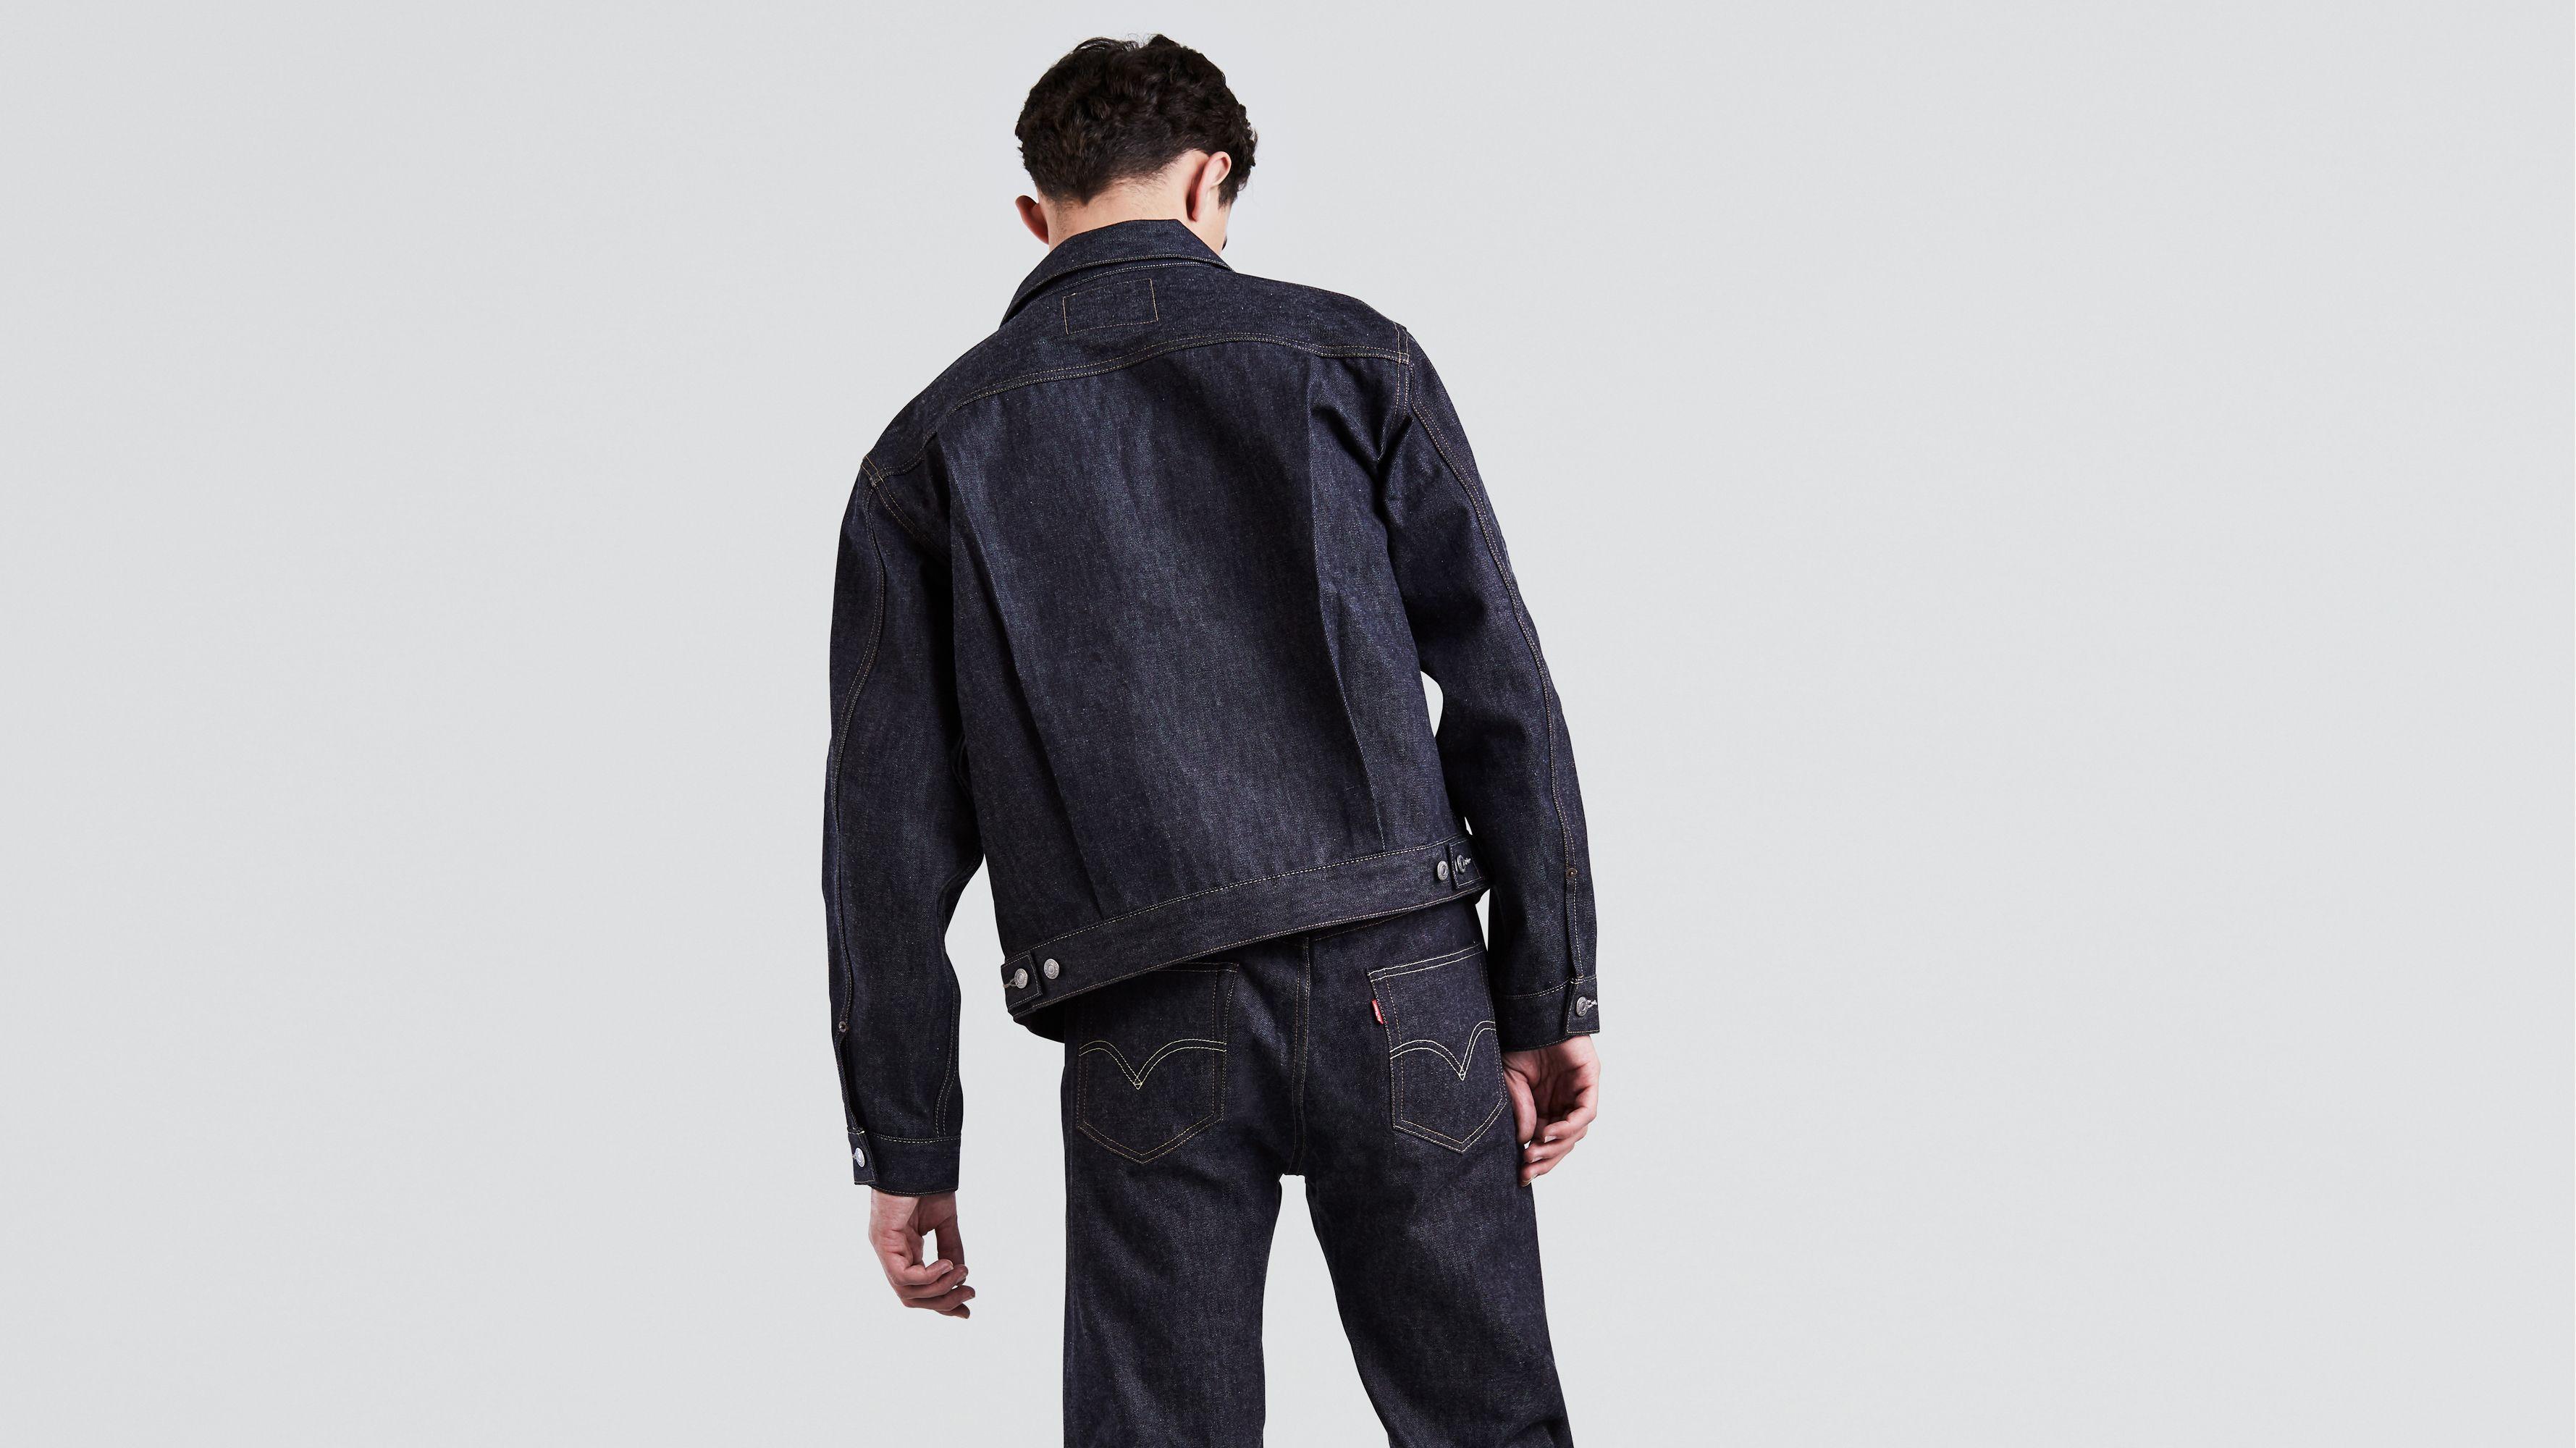 Type Vintage Jacket Levi's® Clothing 1953 P8wkn0O